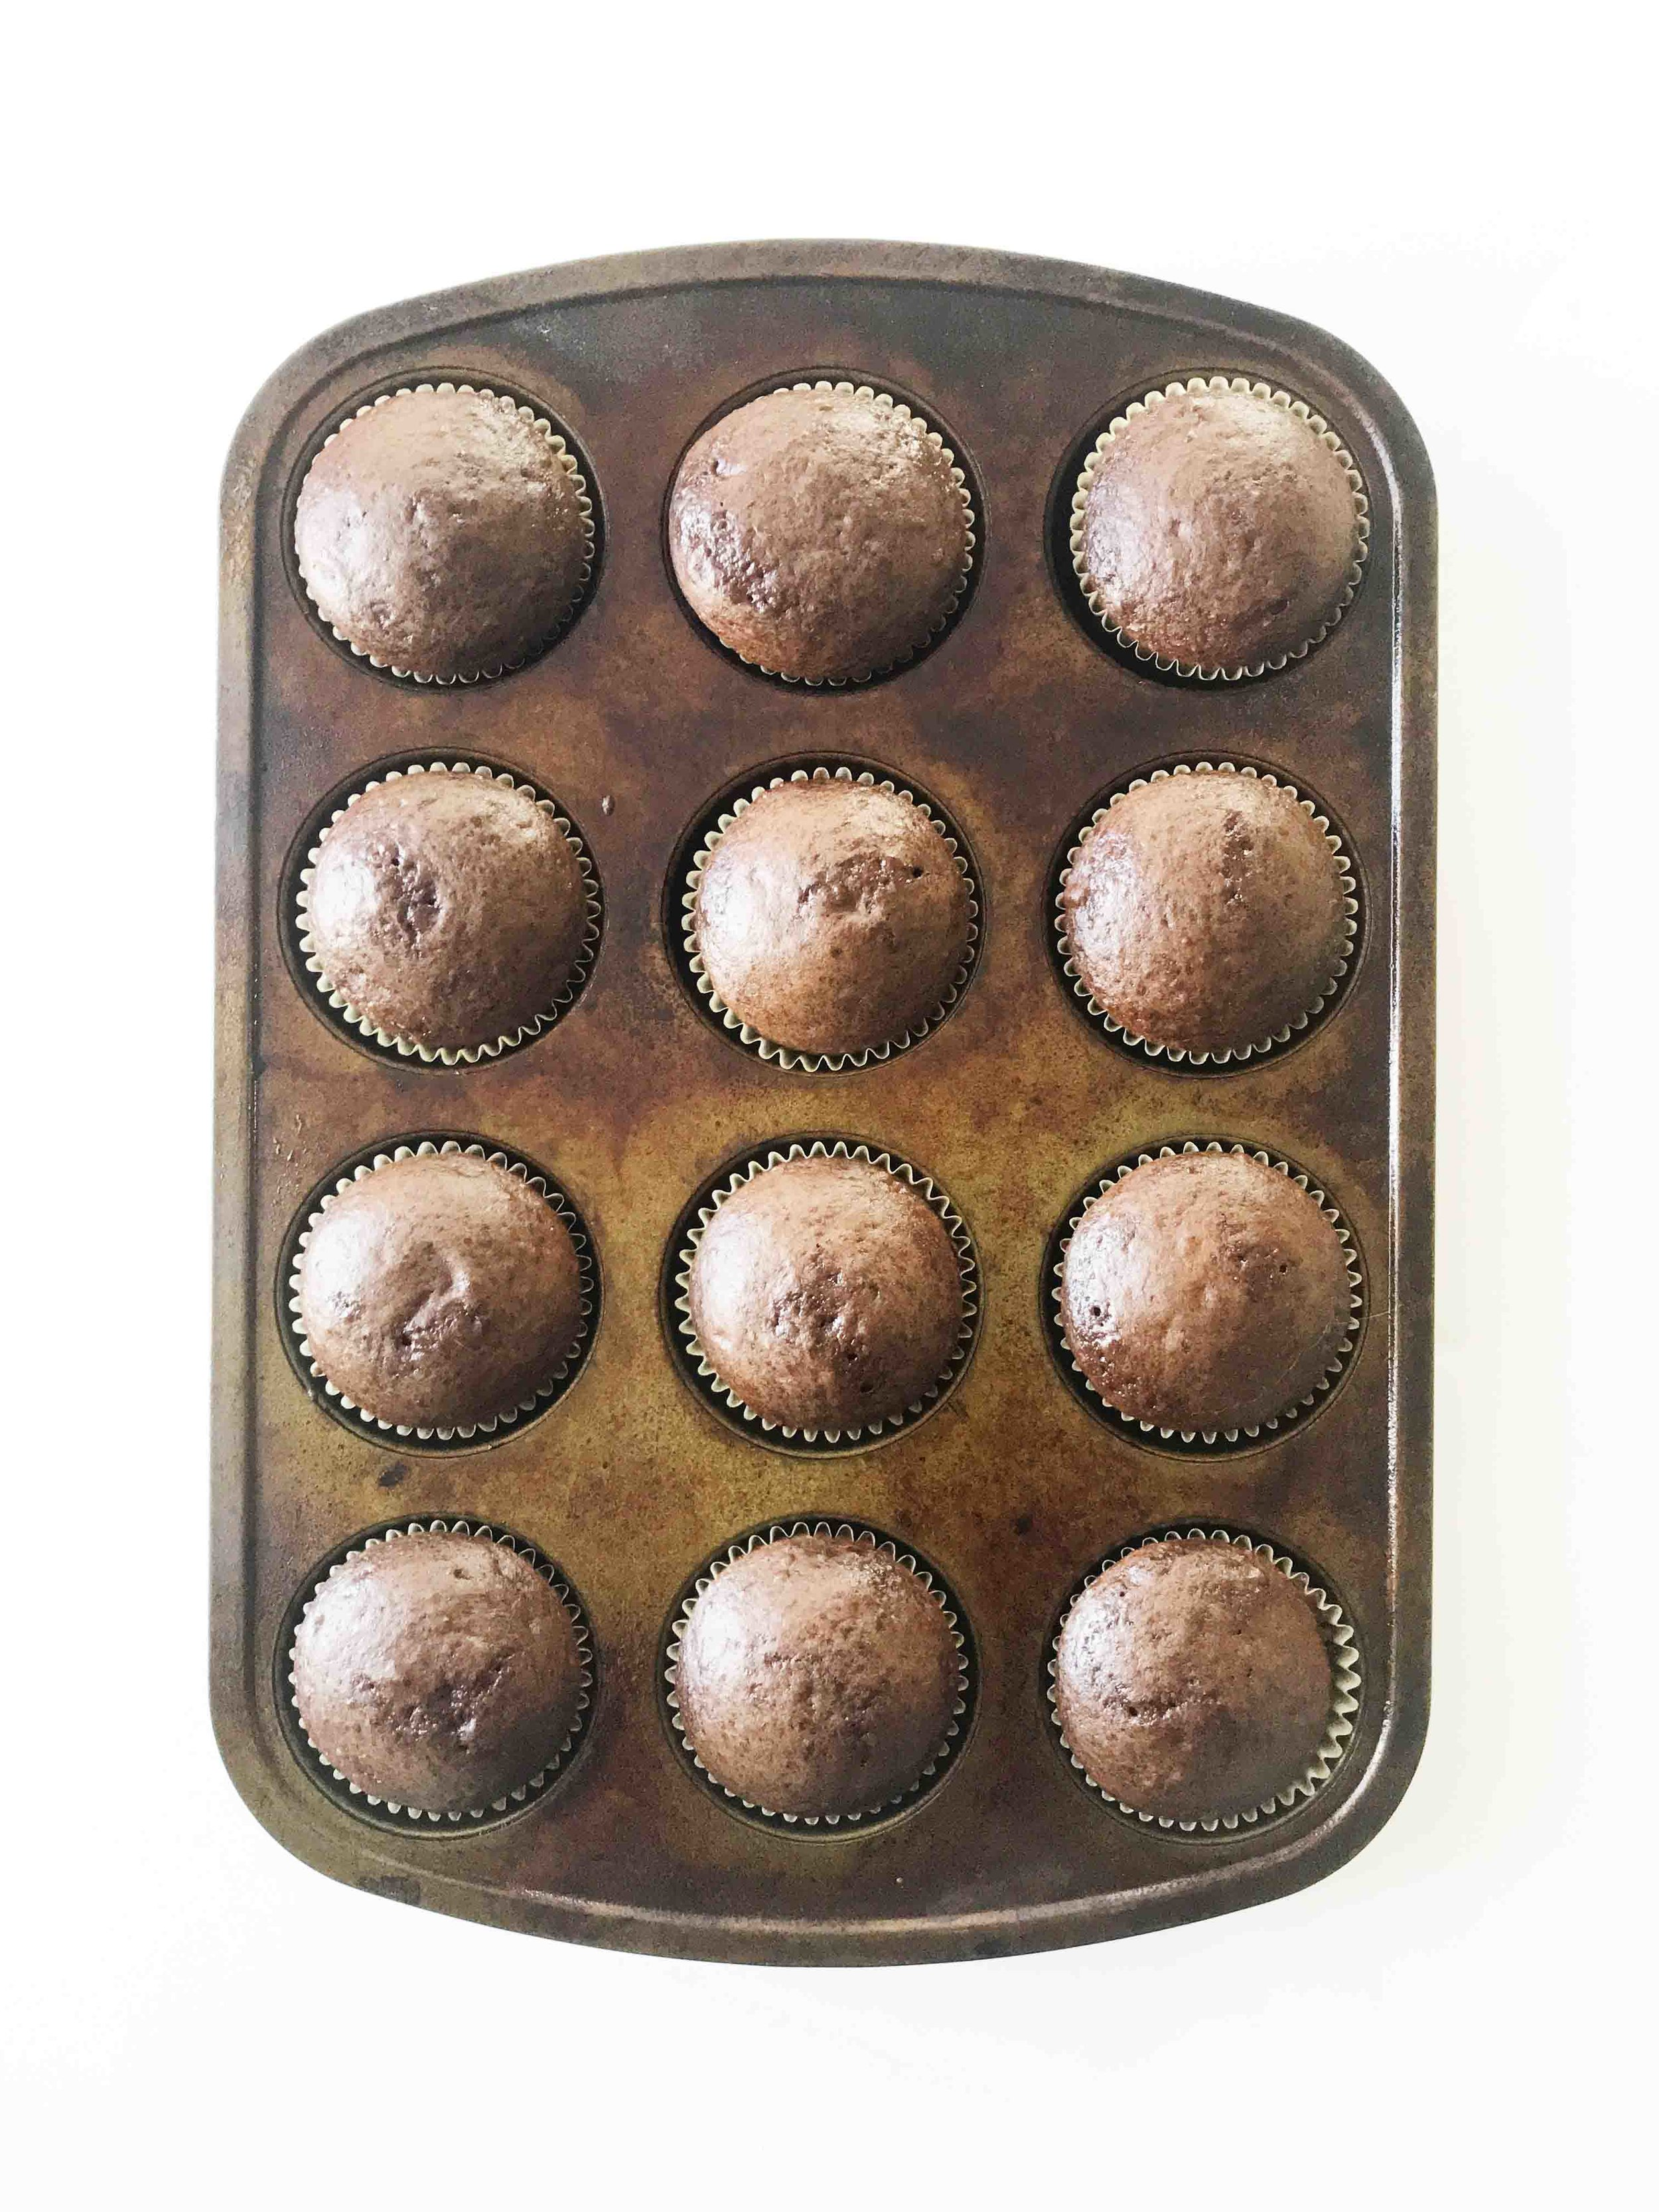 carrot-patch-cupcakes4.jpg